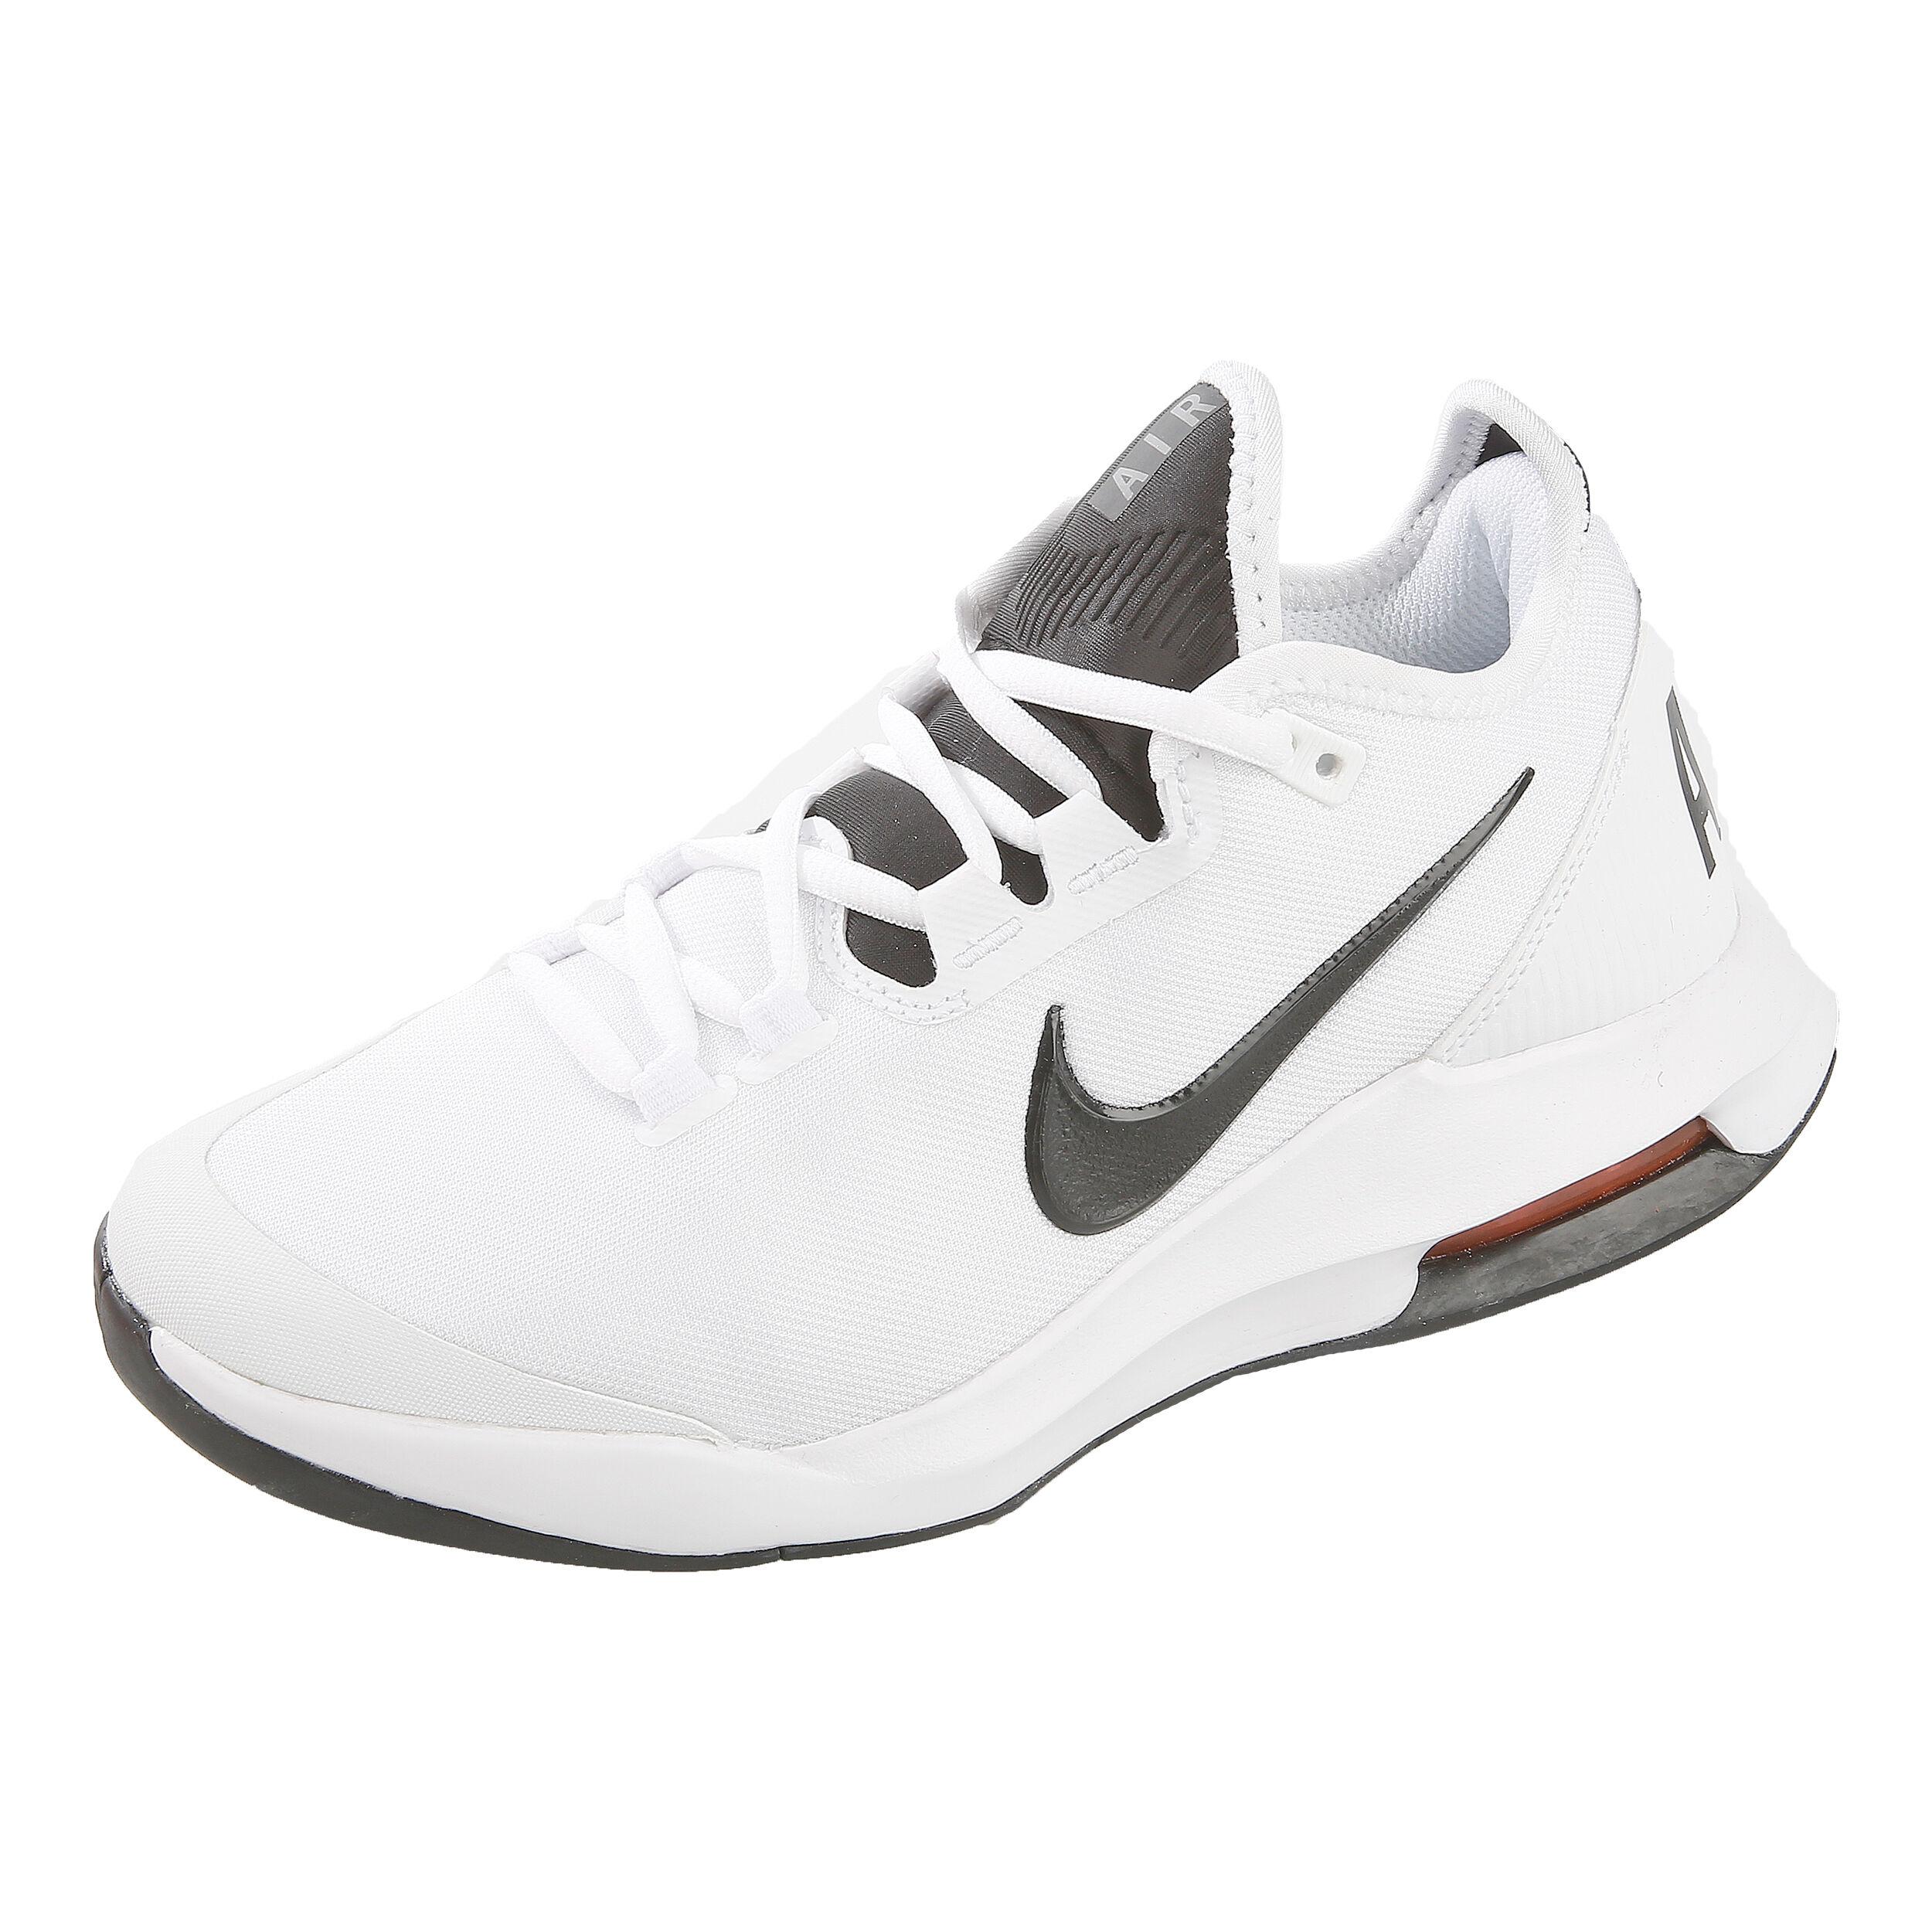 Nike Air Max Wildcard HC Zapatilla Todas Las Superficies